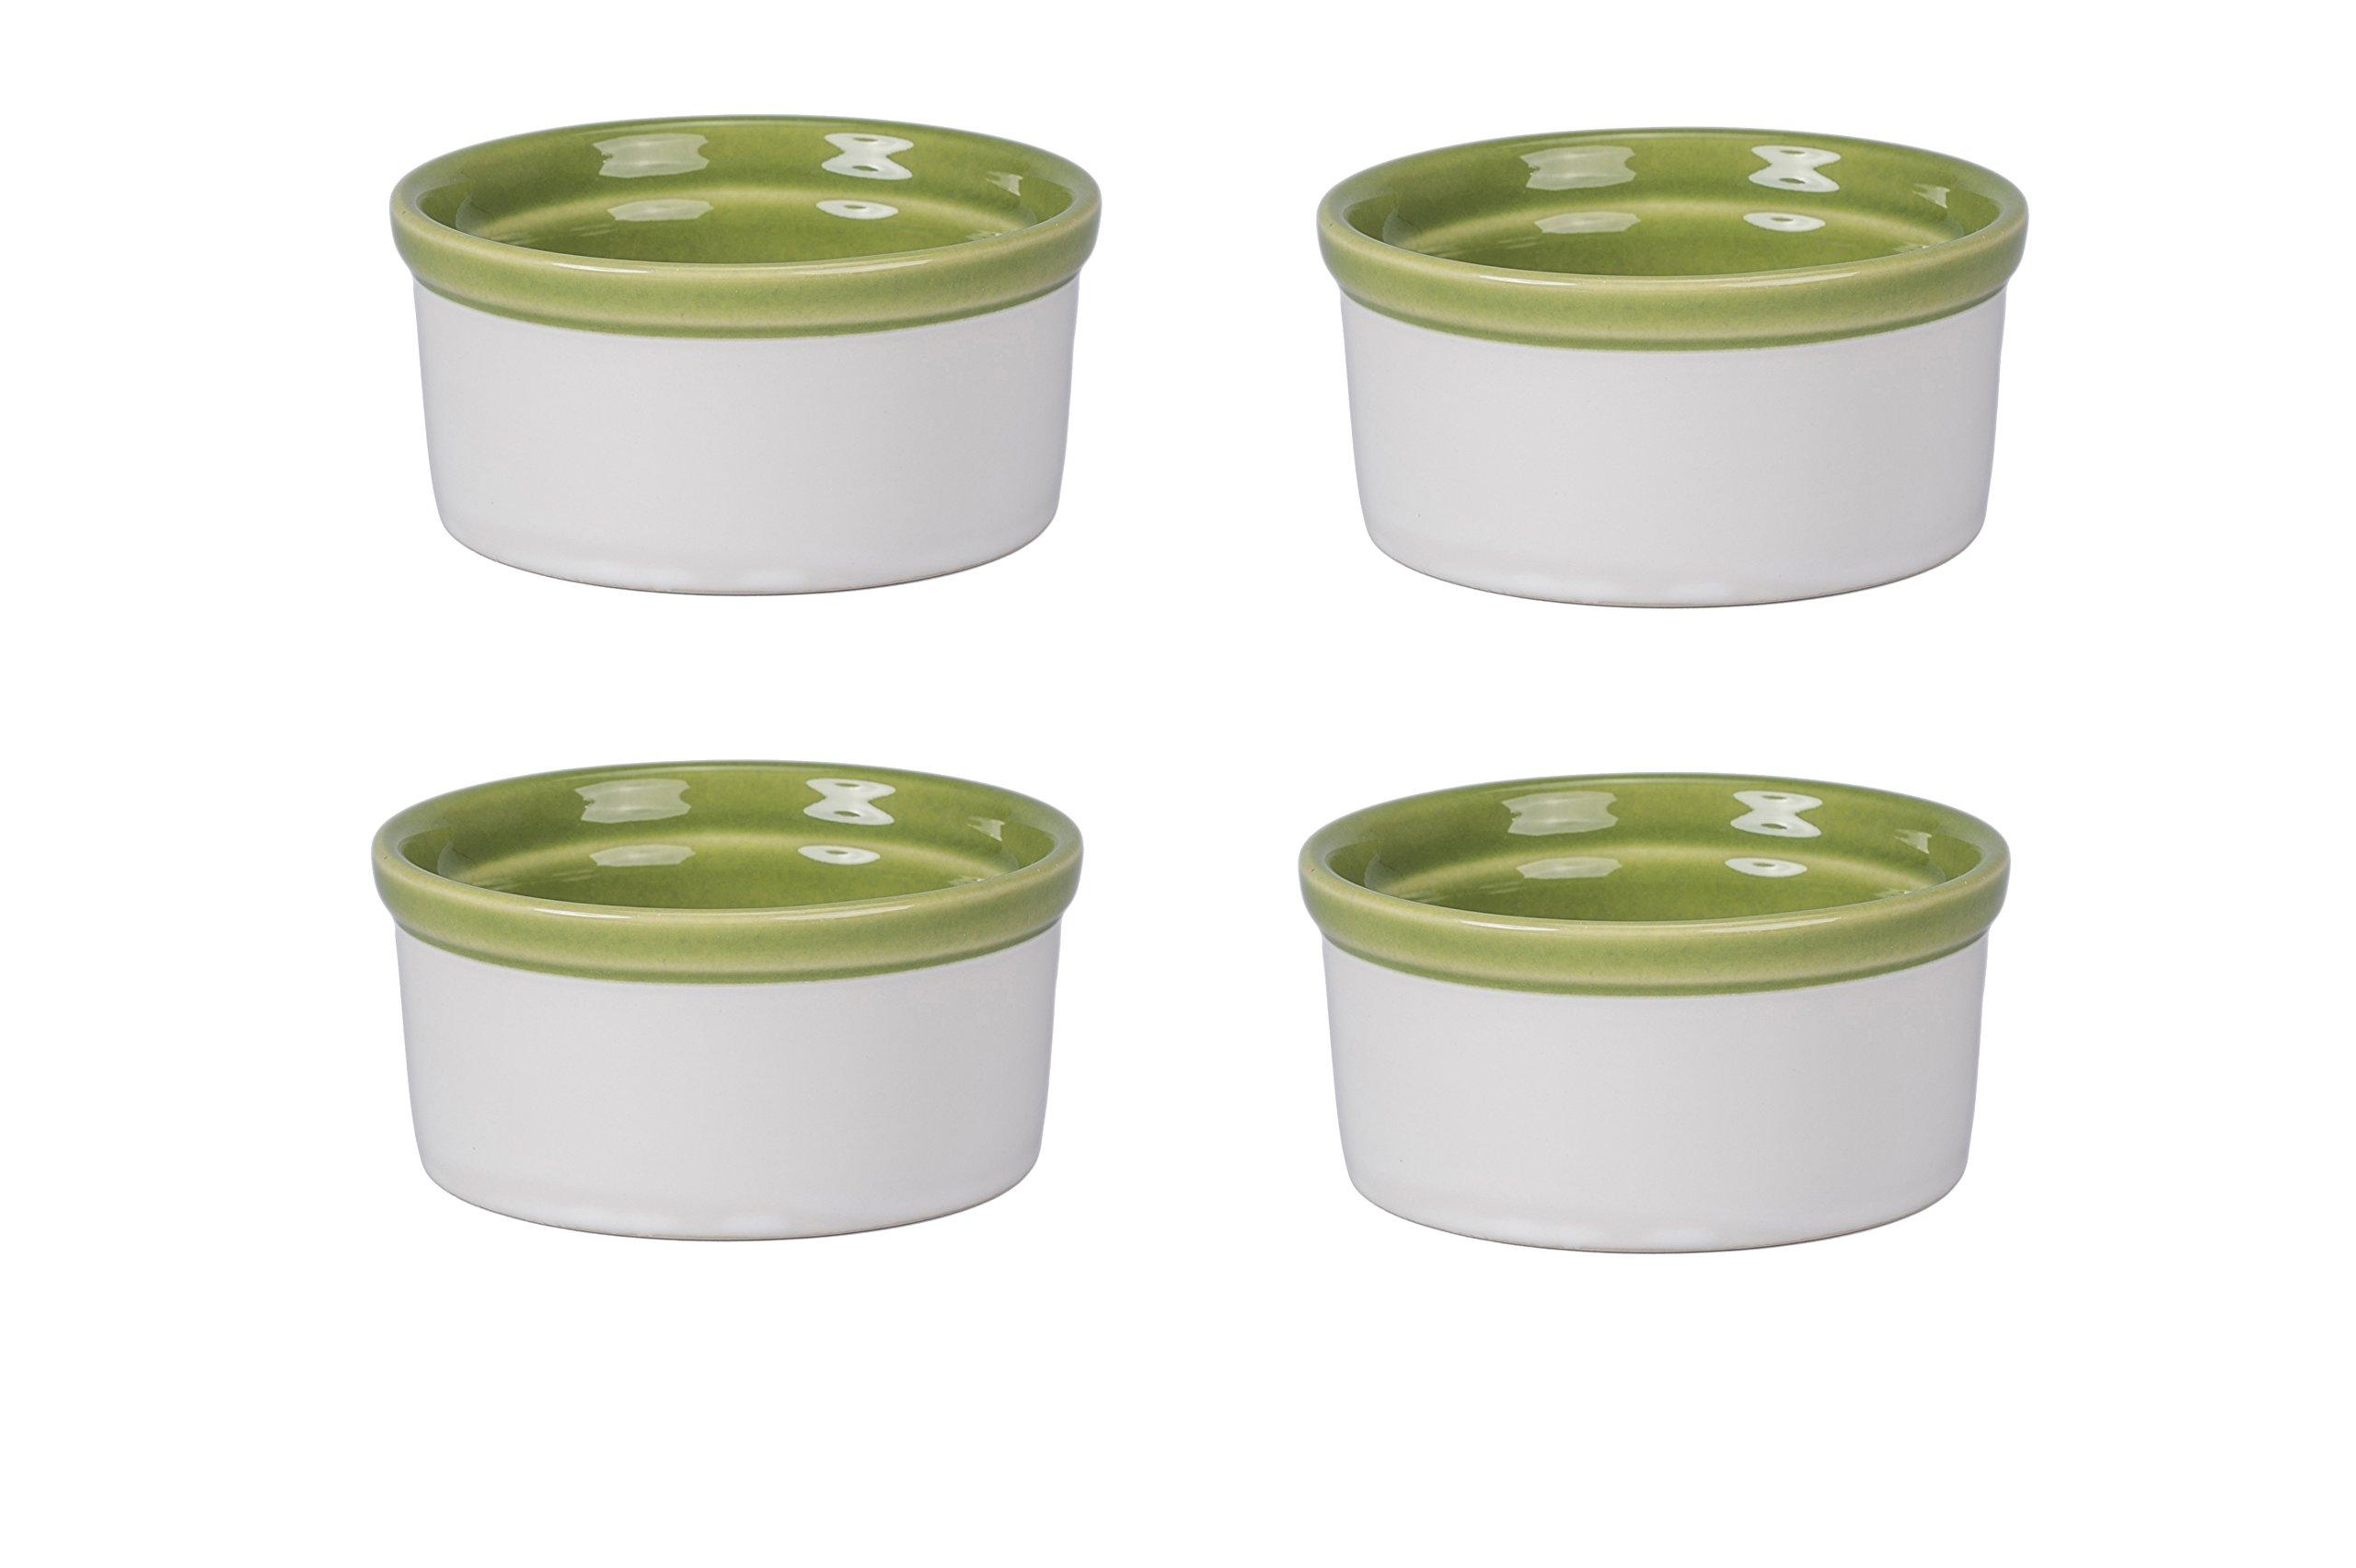 BIA Cordon Bleu 404991+3094S4SIOC Individual Souffle Dish, 4.5, Grass Green/White